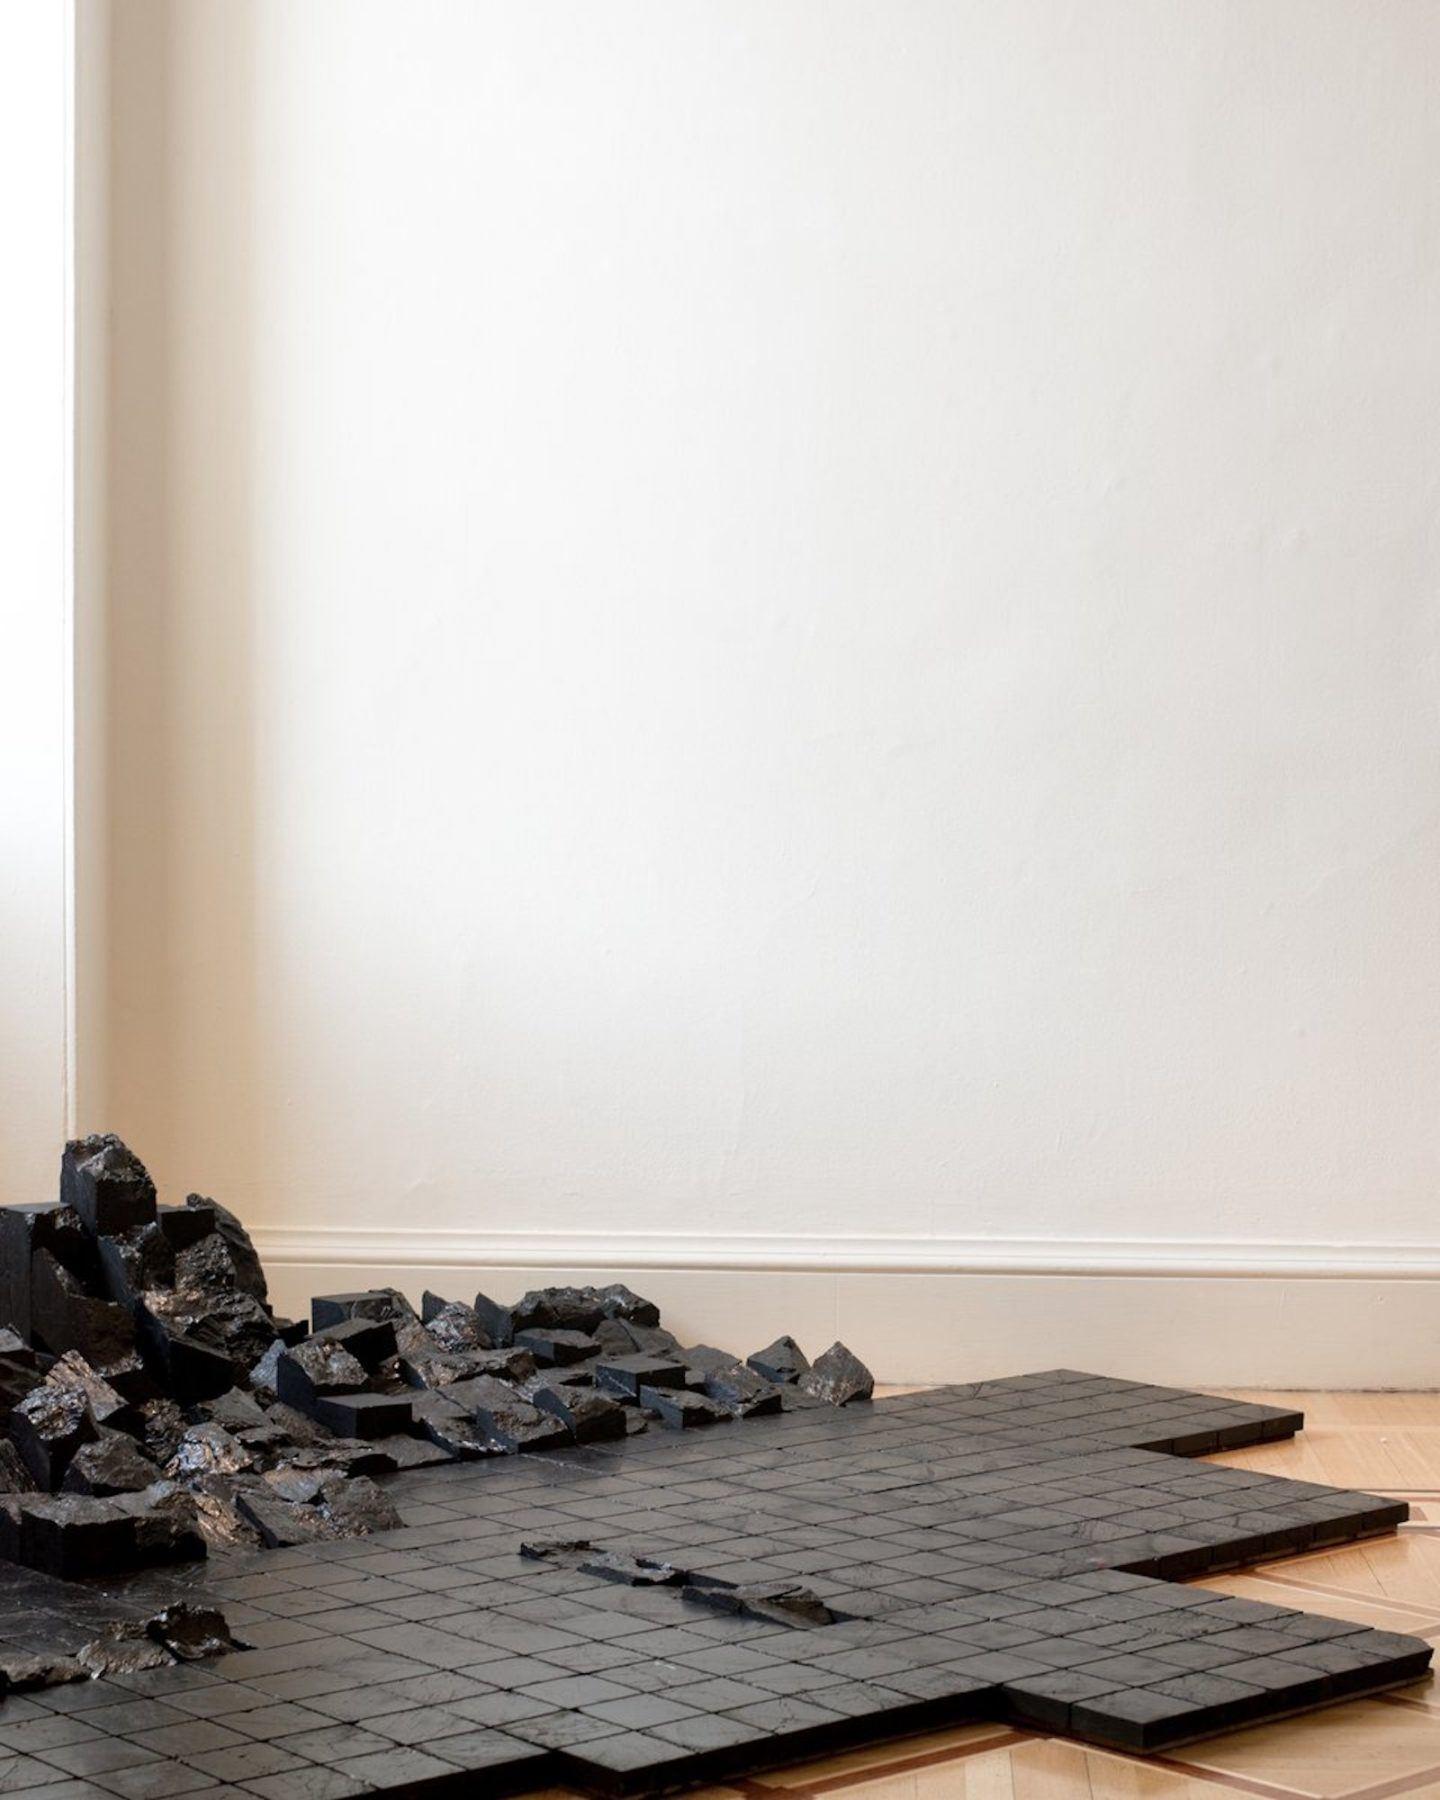 IGNANT-Design-Jesper-Eriksson-Coal-Post-Fuel-007